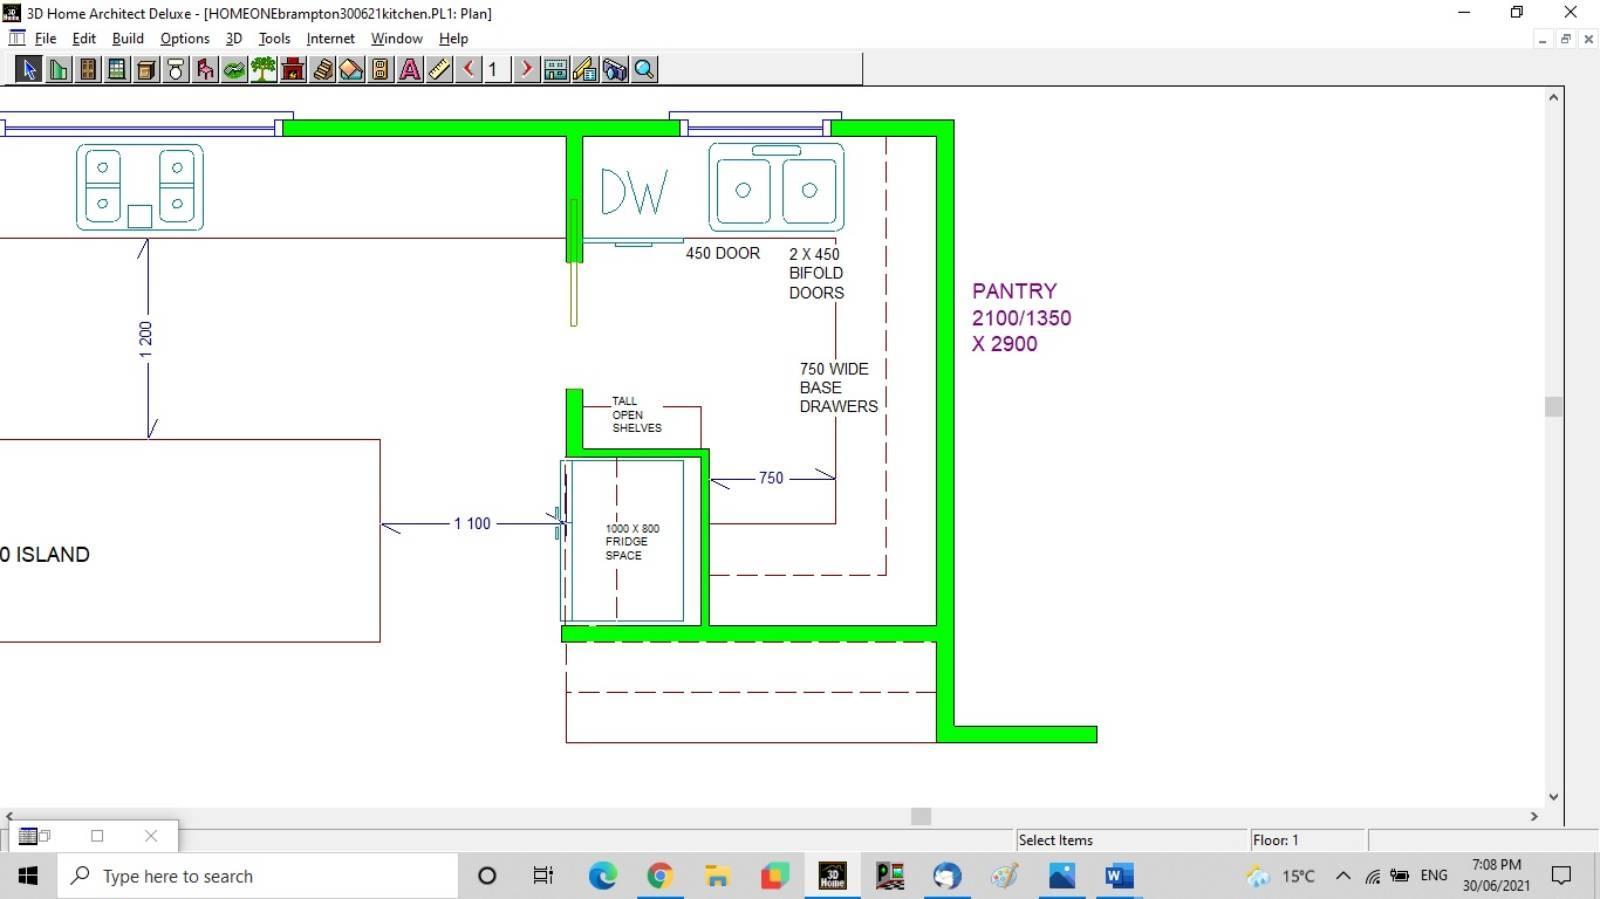 Seeking help with kitchen/butler pantry floorplan